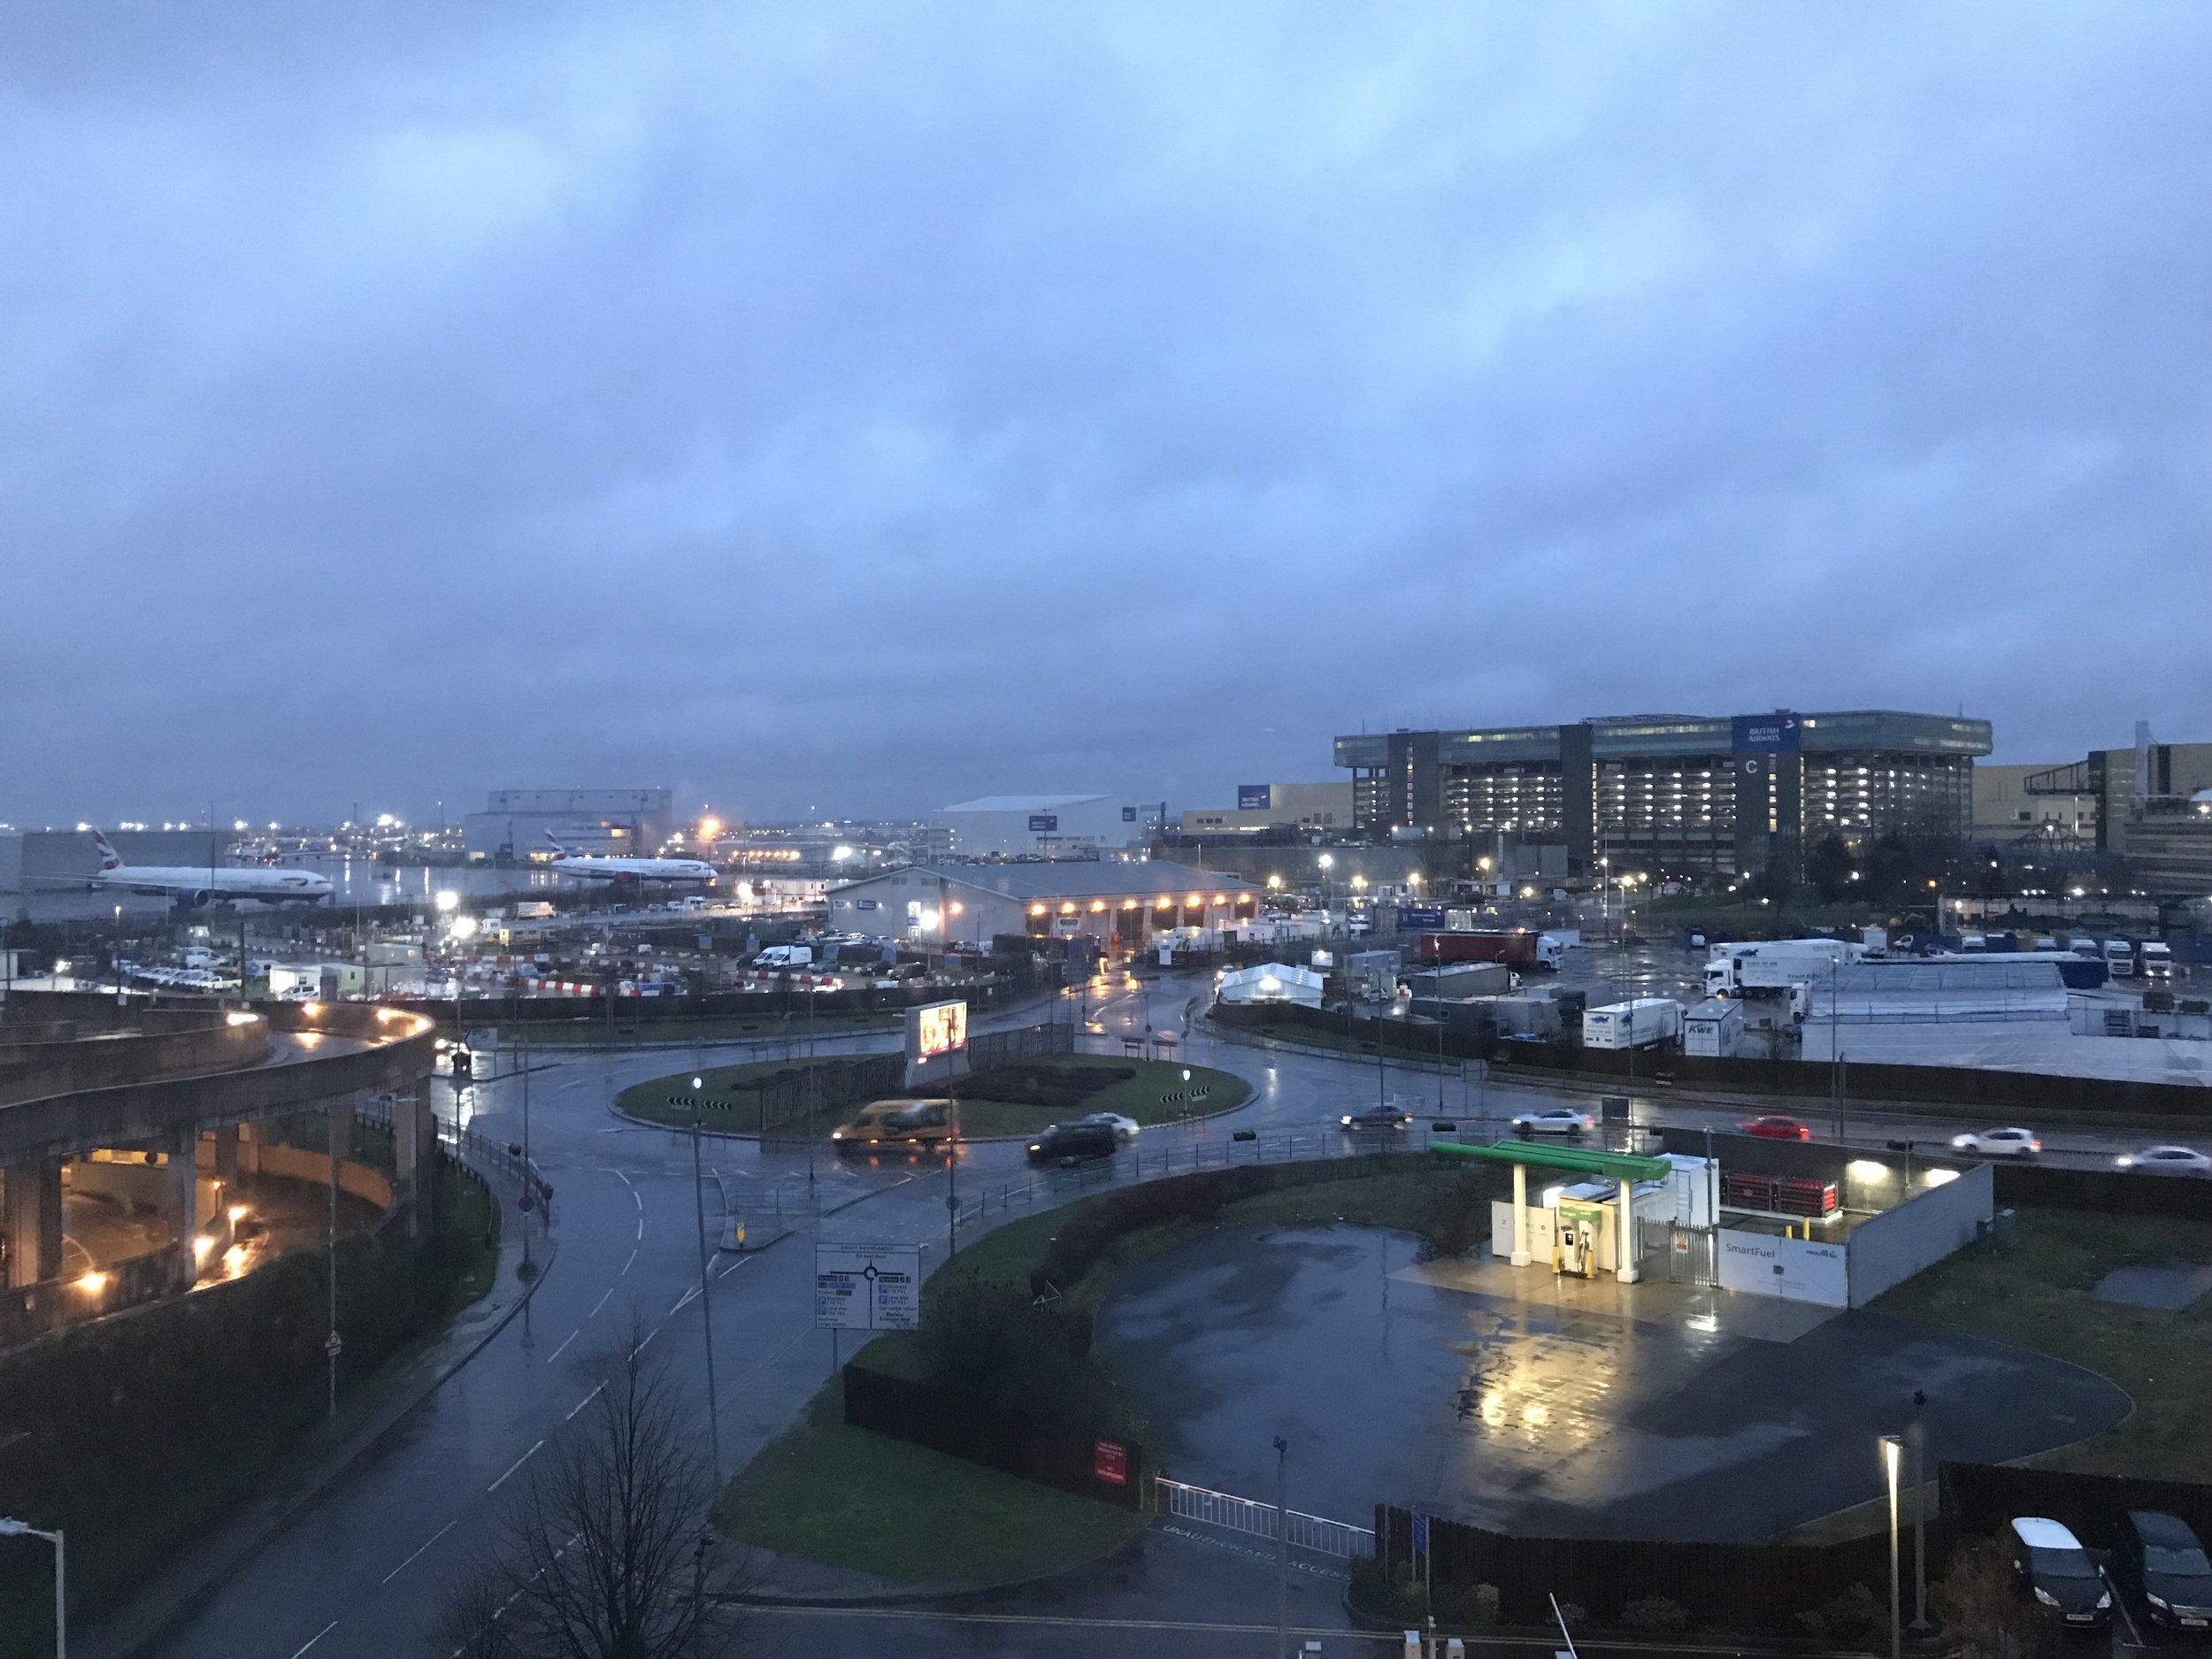 HGI London Heathrow room view